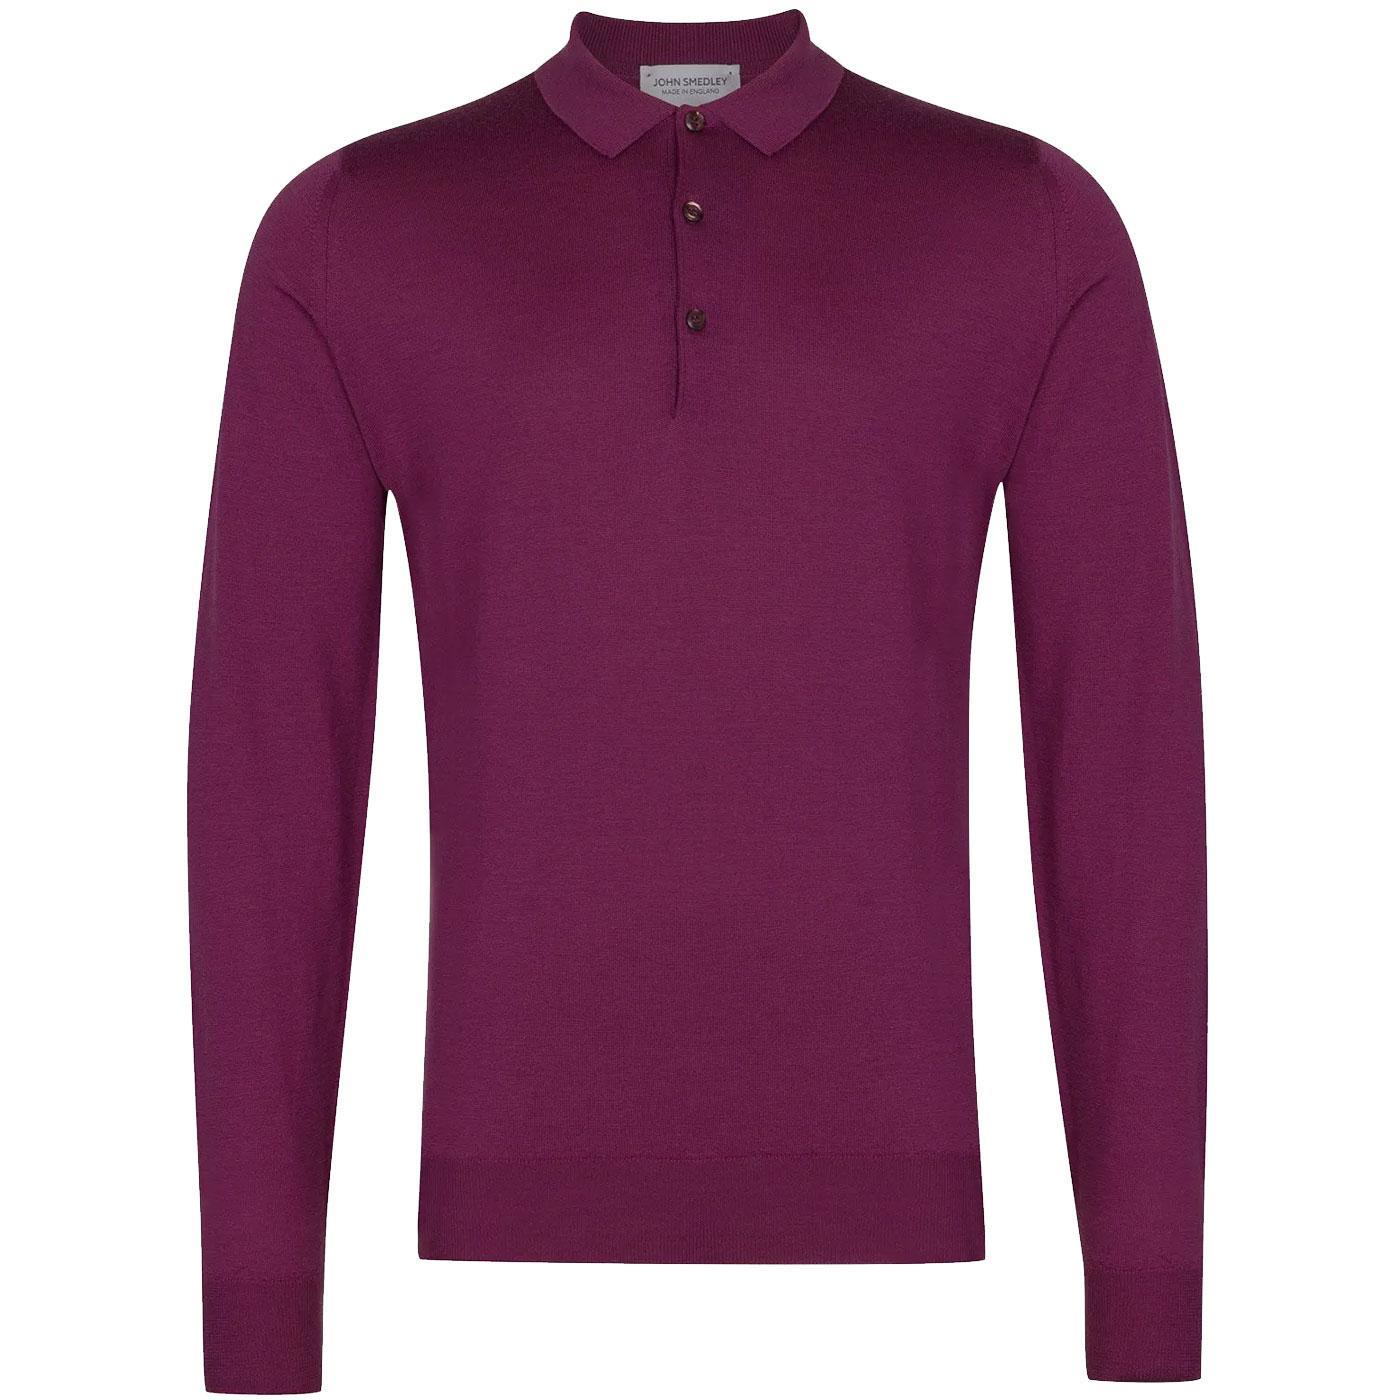 Belper JOHN SMEDLEY L/S Knitted Mod Polo Shirt WH